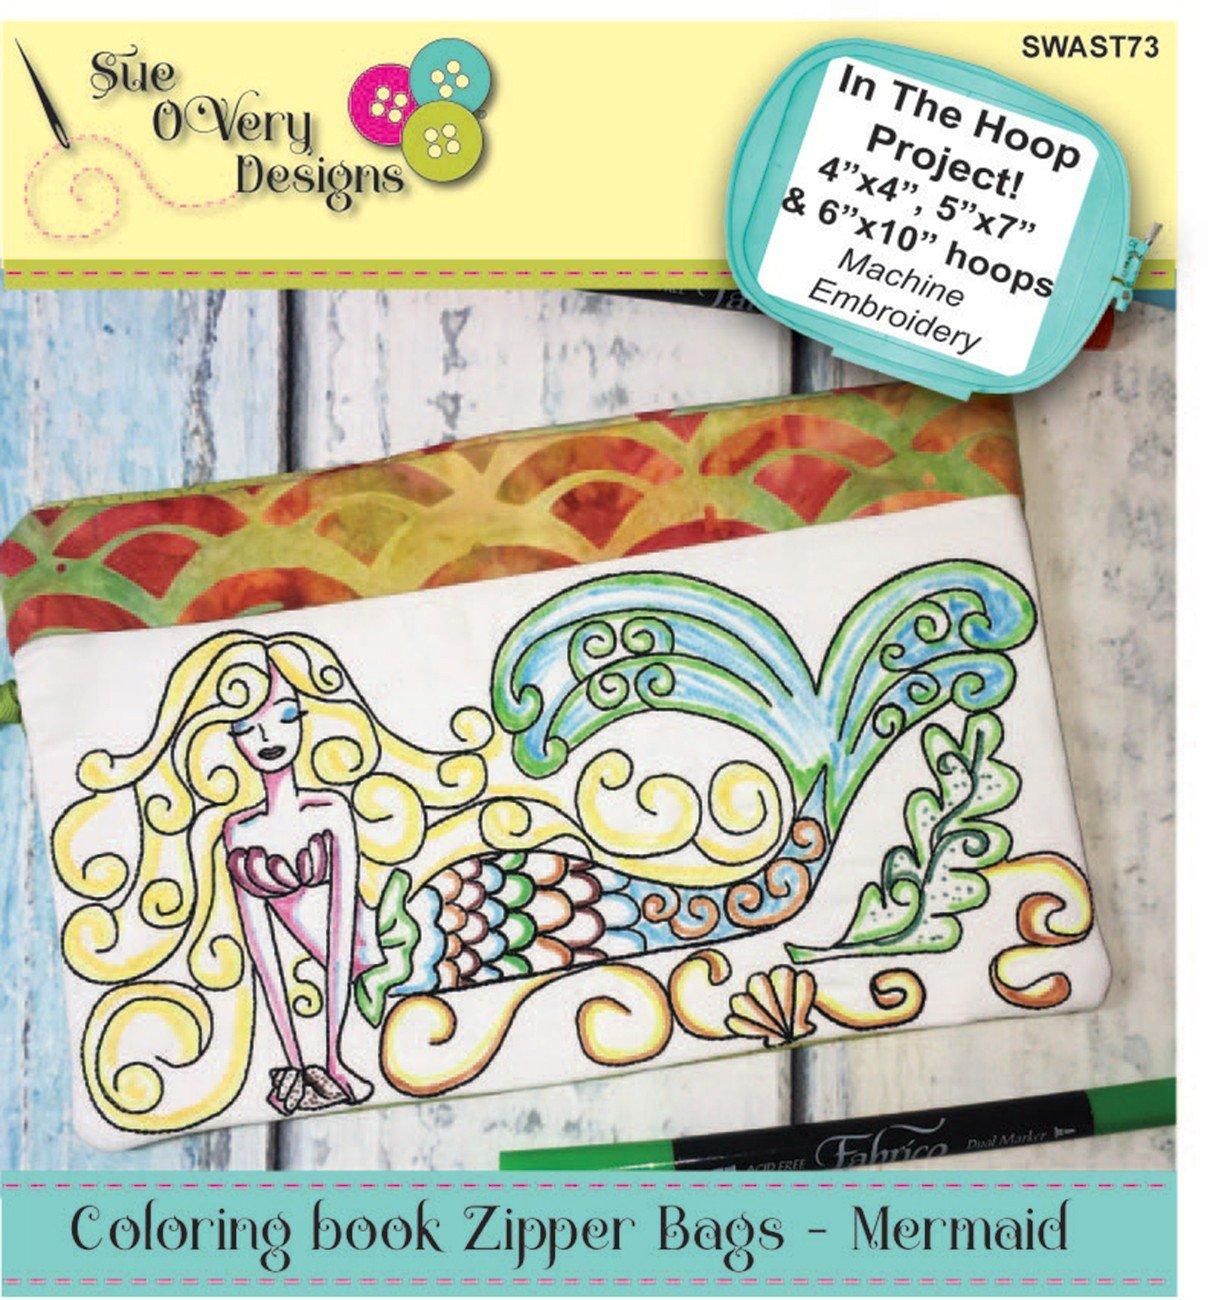 CD Coloring Book Zipper Pouch In the Hoop - Mermaid